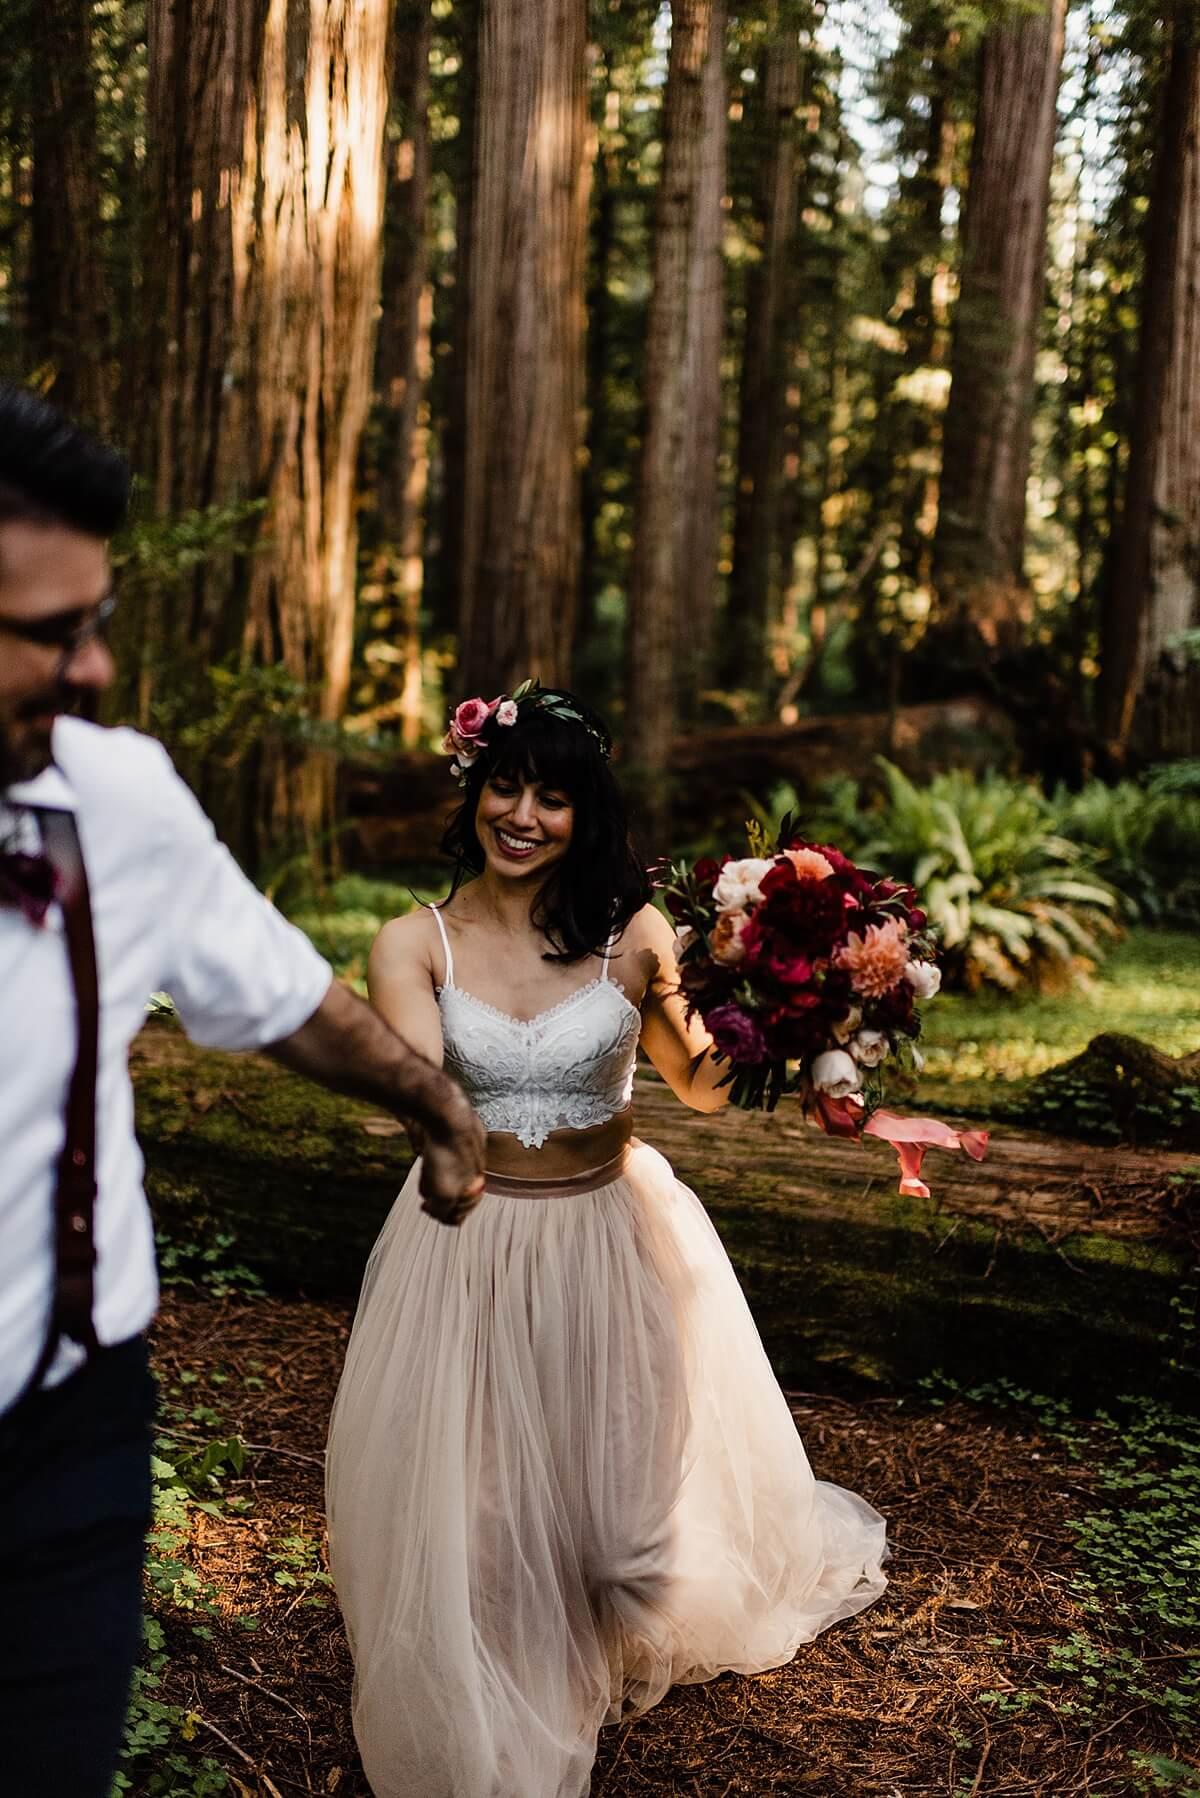 Allison-Brooks-Jedediah-Smiith-Redwoods-Adventure-Elopement-Wedding-S-Photography-Blog_0047.jpg